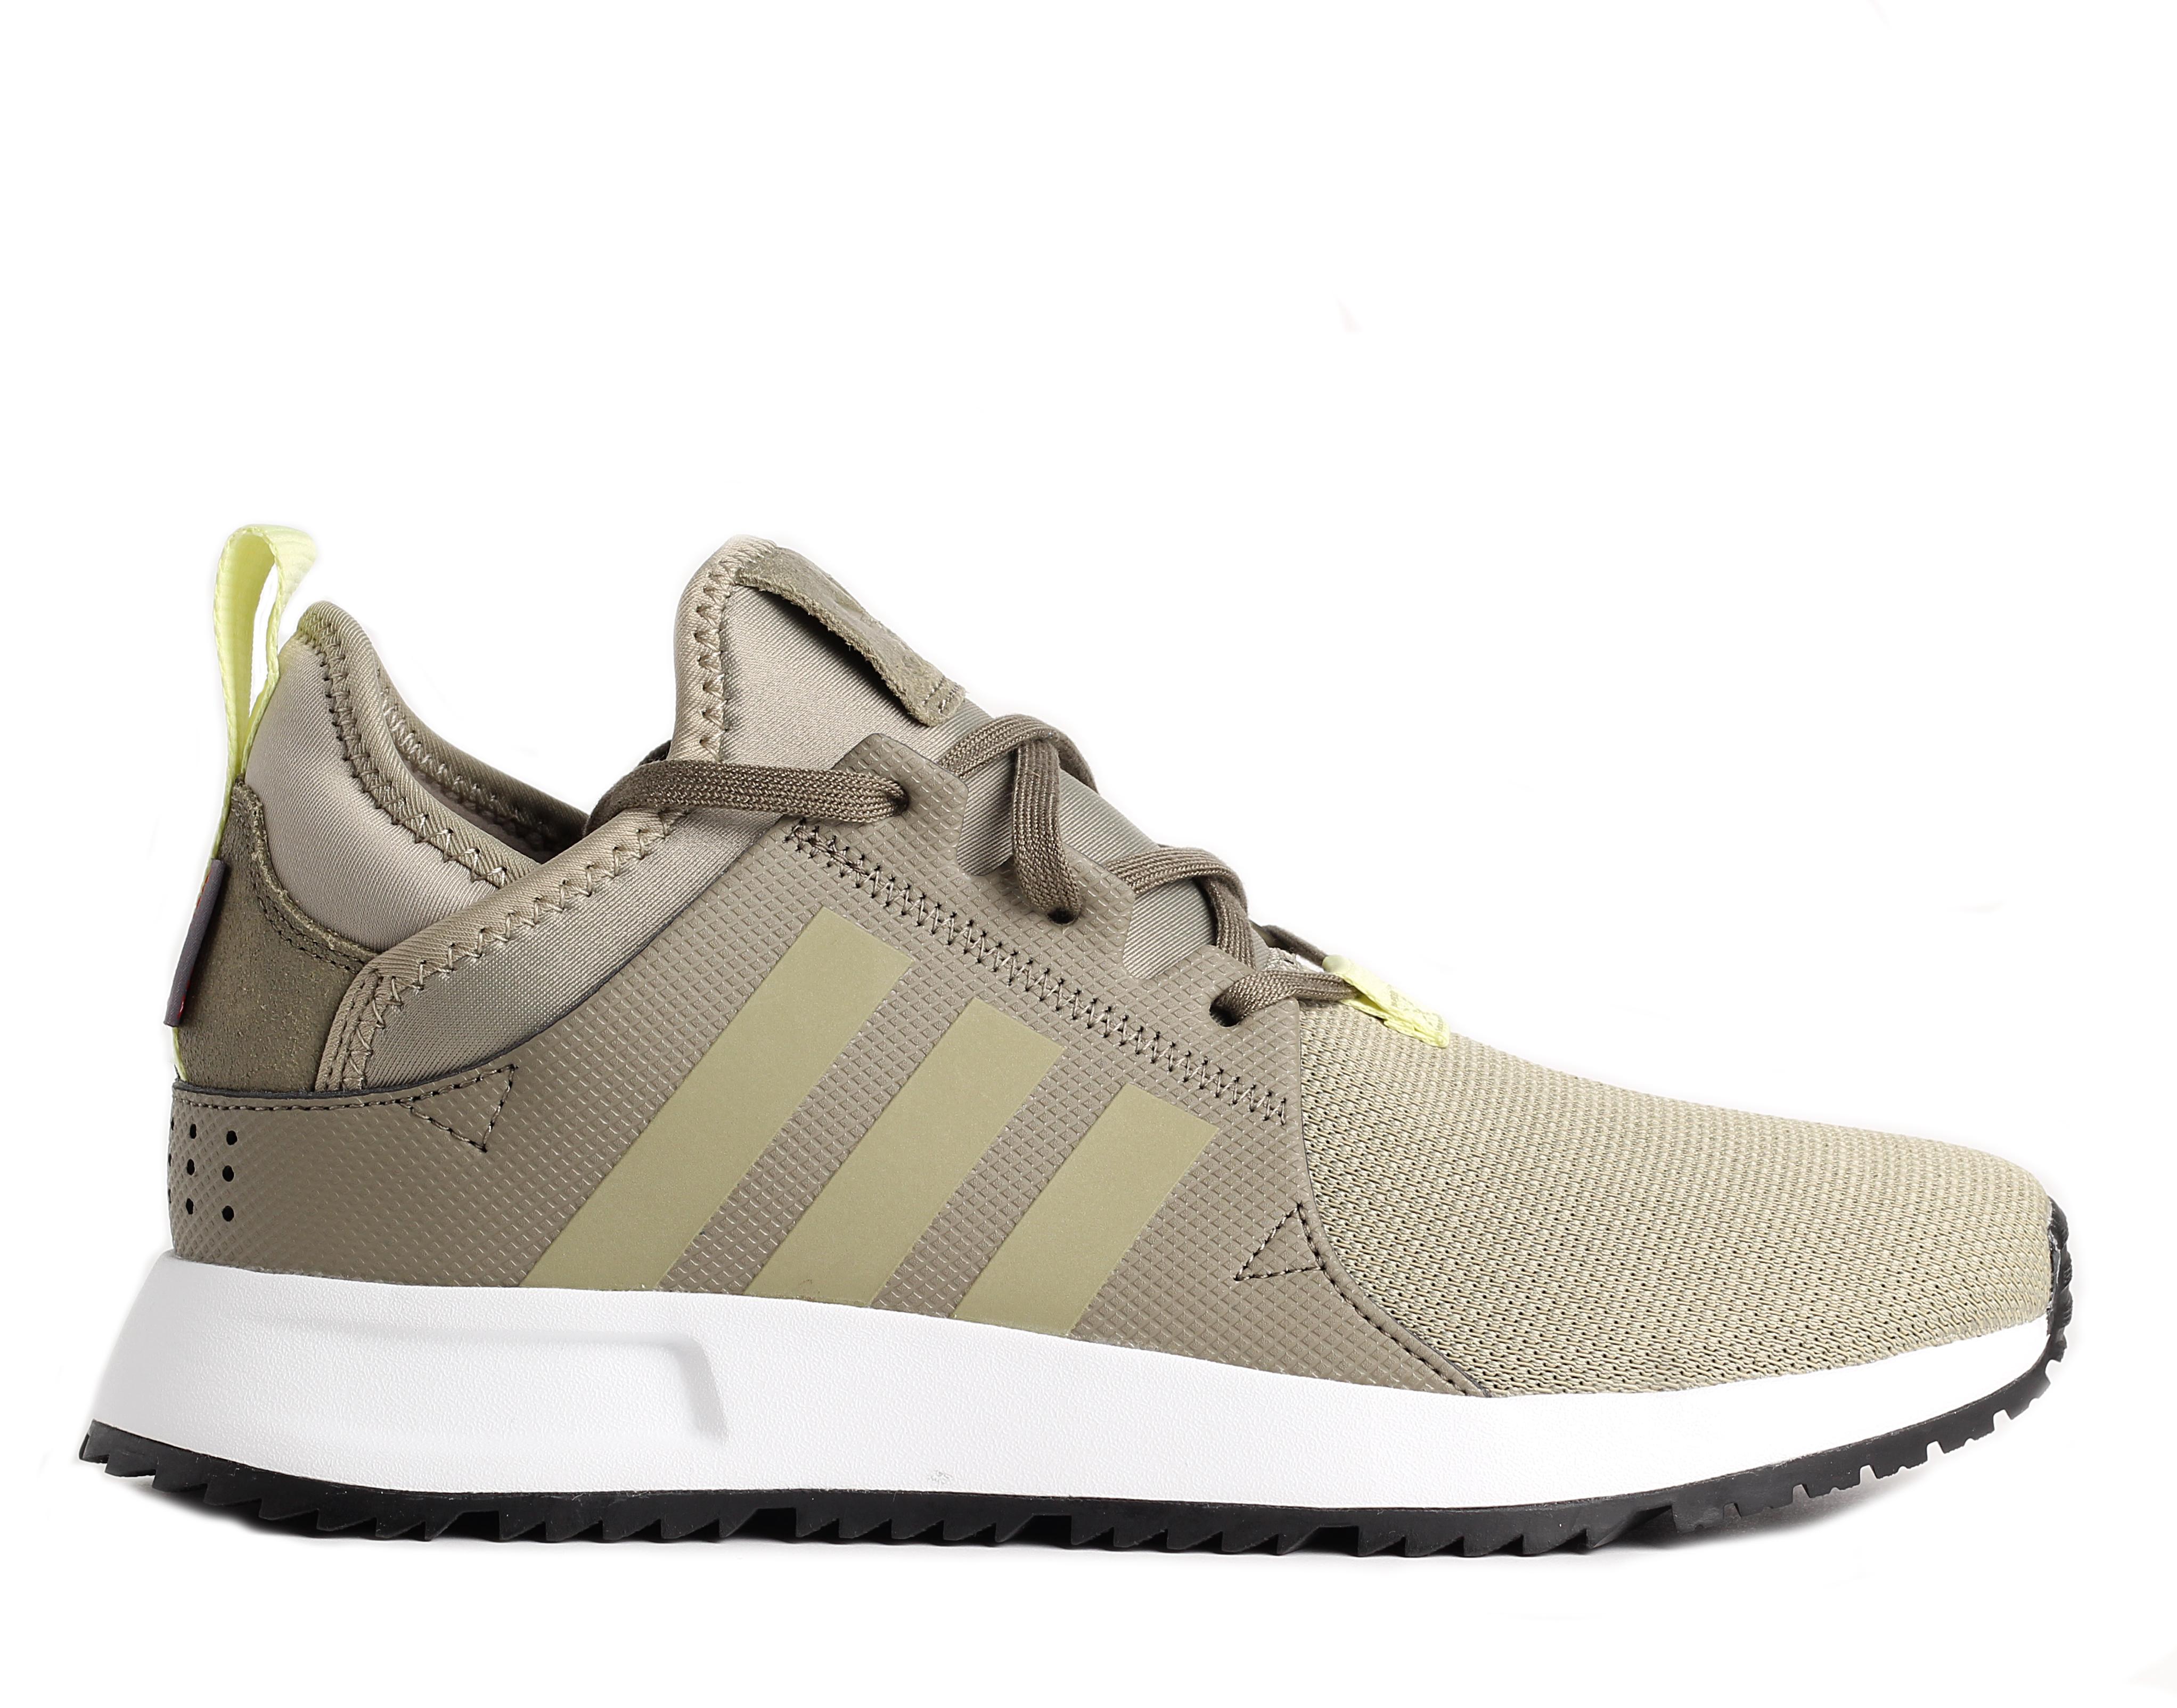 adidas Adidas X_PLR Sneakerboot Night Cargo/ Tech Beige/ Core Black CT90zcU